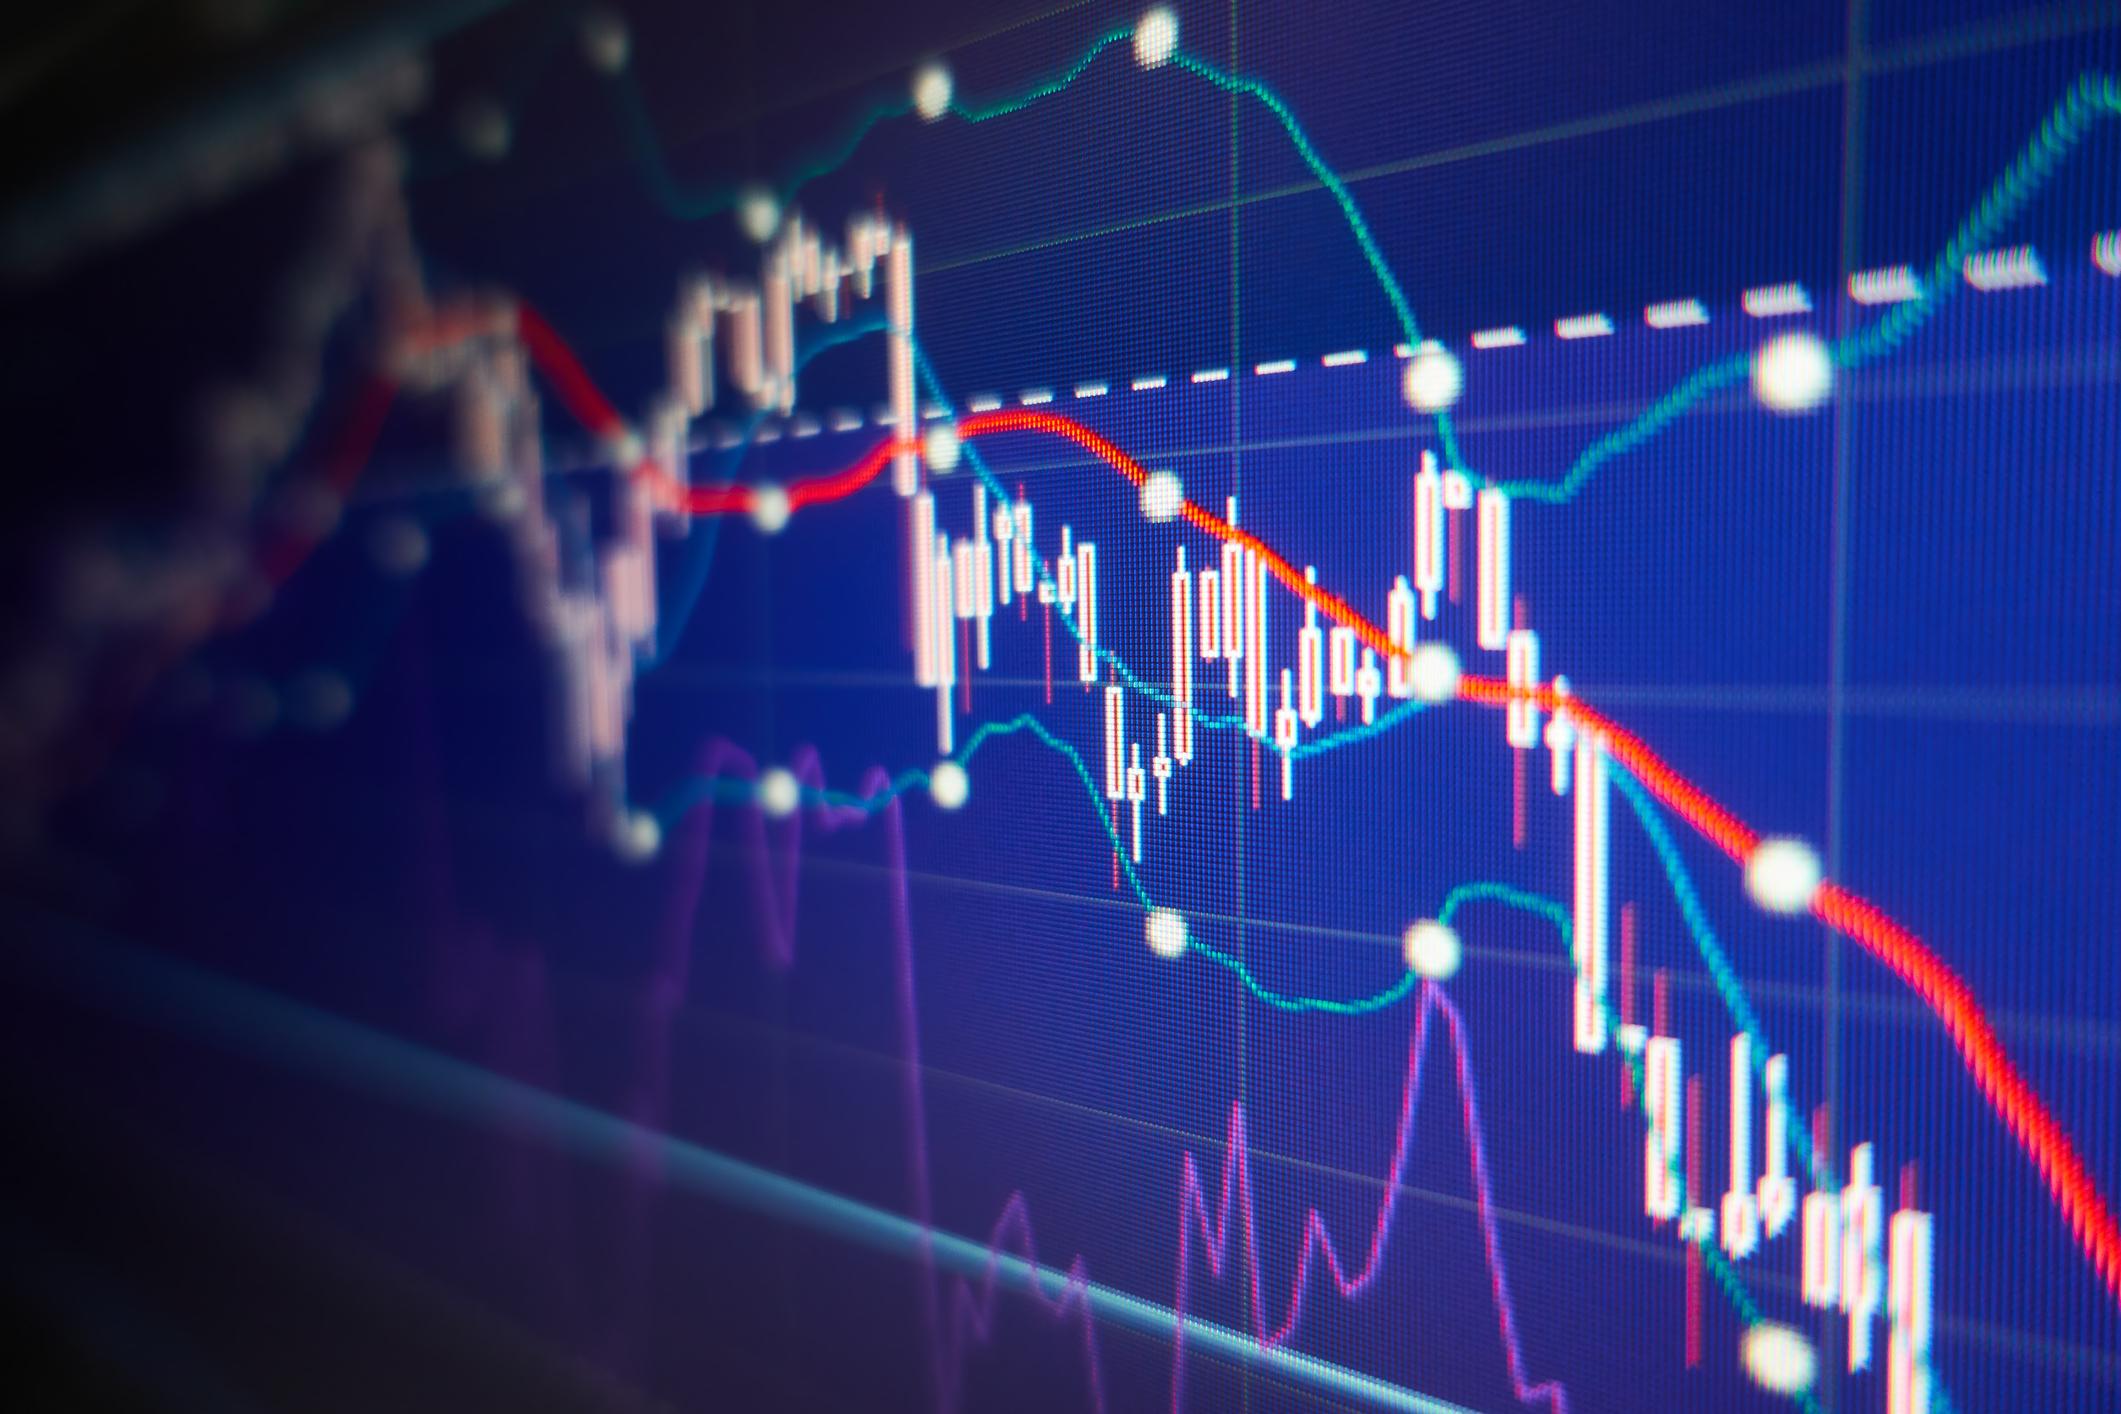 A stock chart trending downward